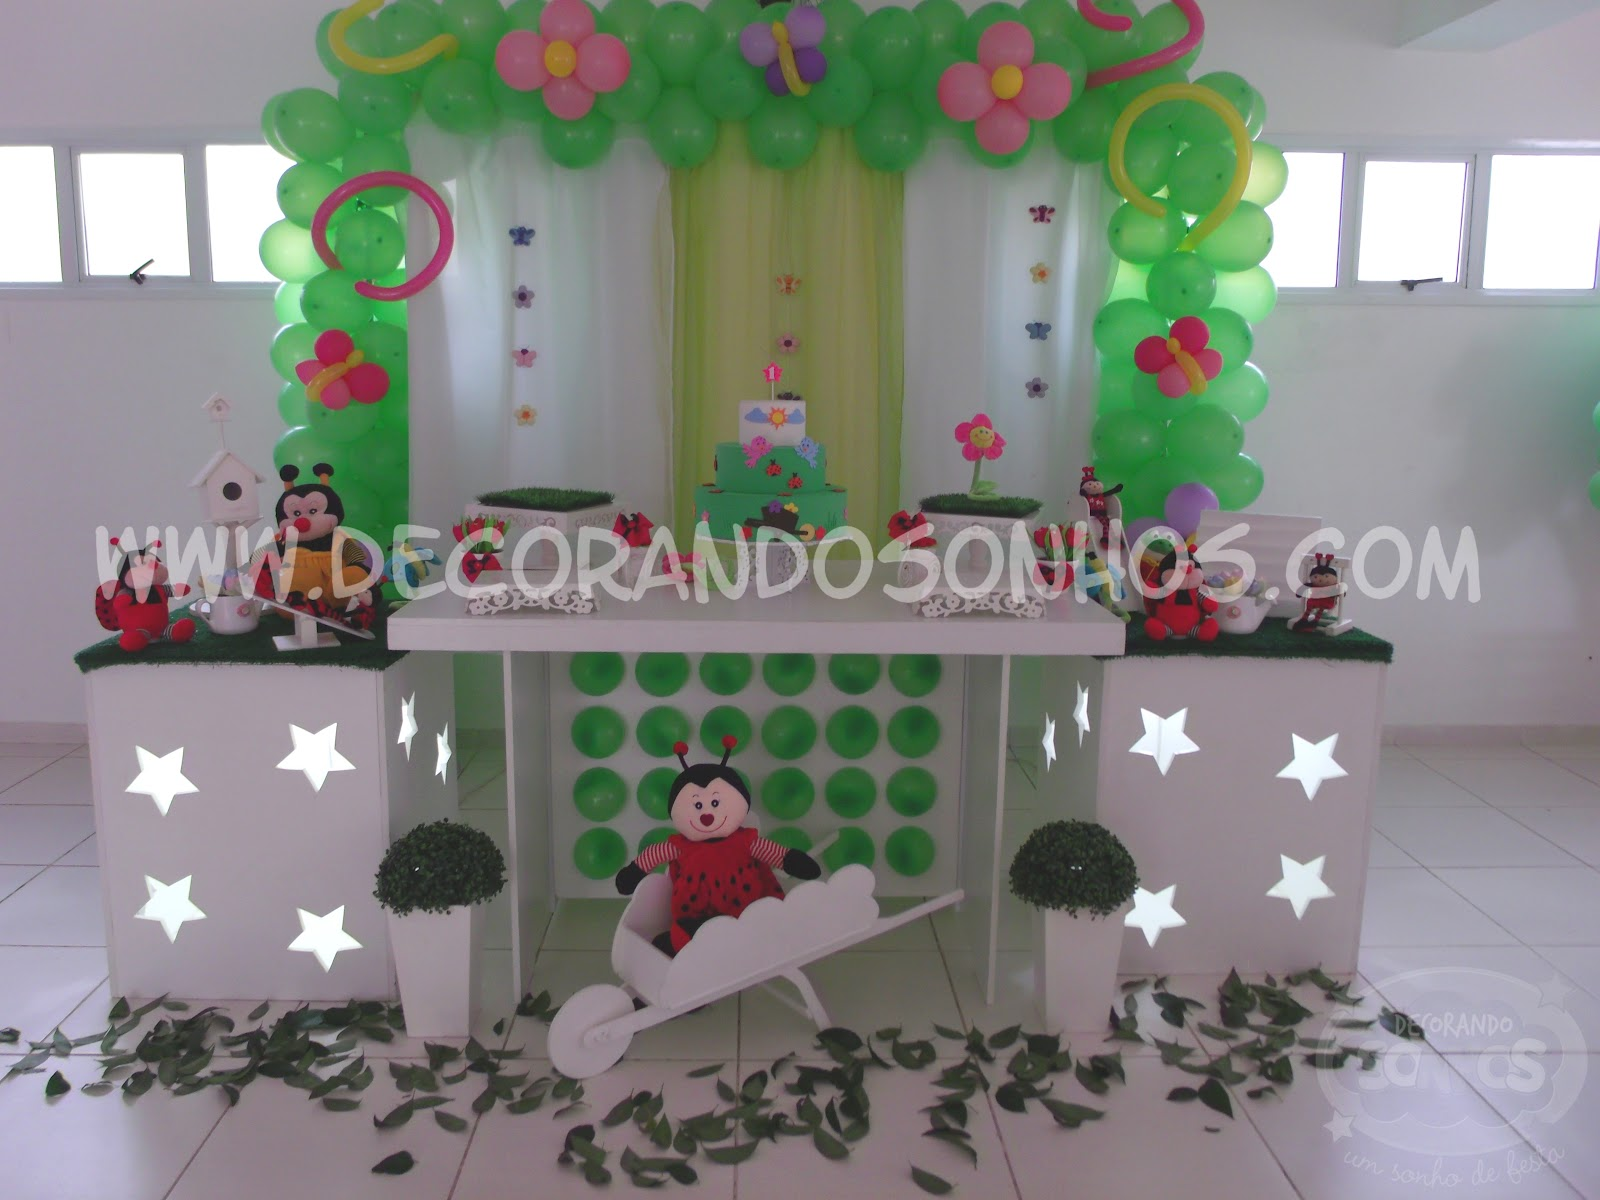 decoracao+jardim+encantado+clean+festa+infantil+jardim+encantado